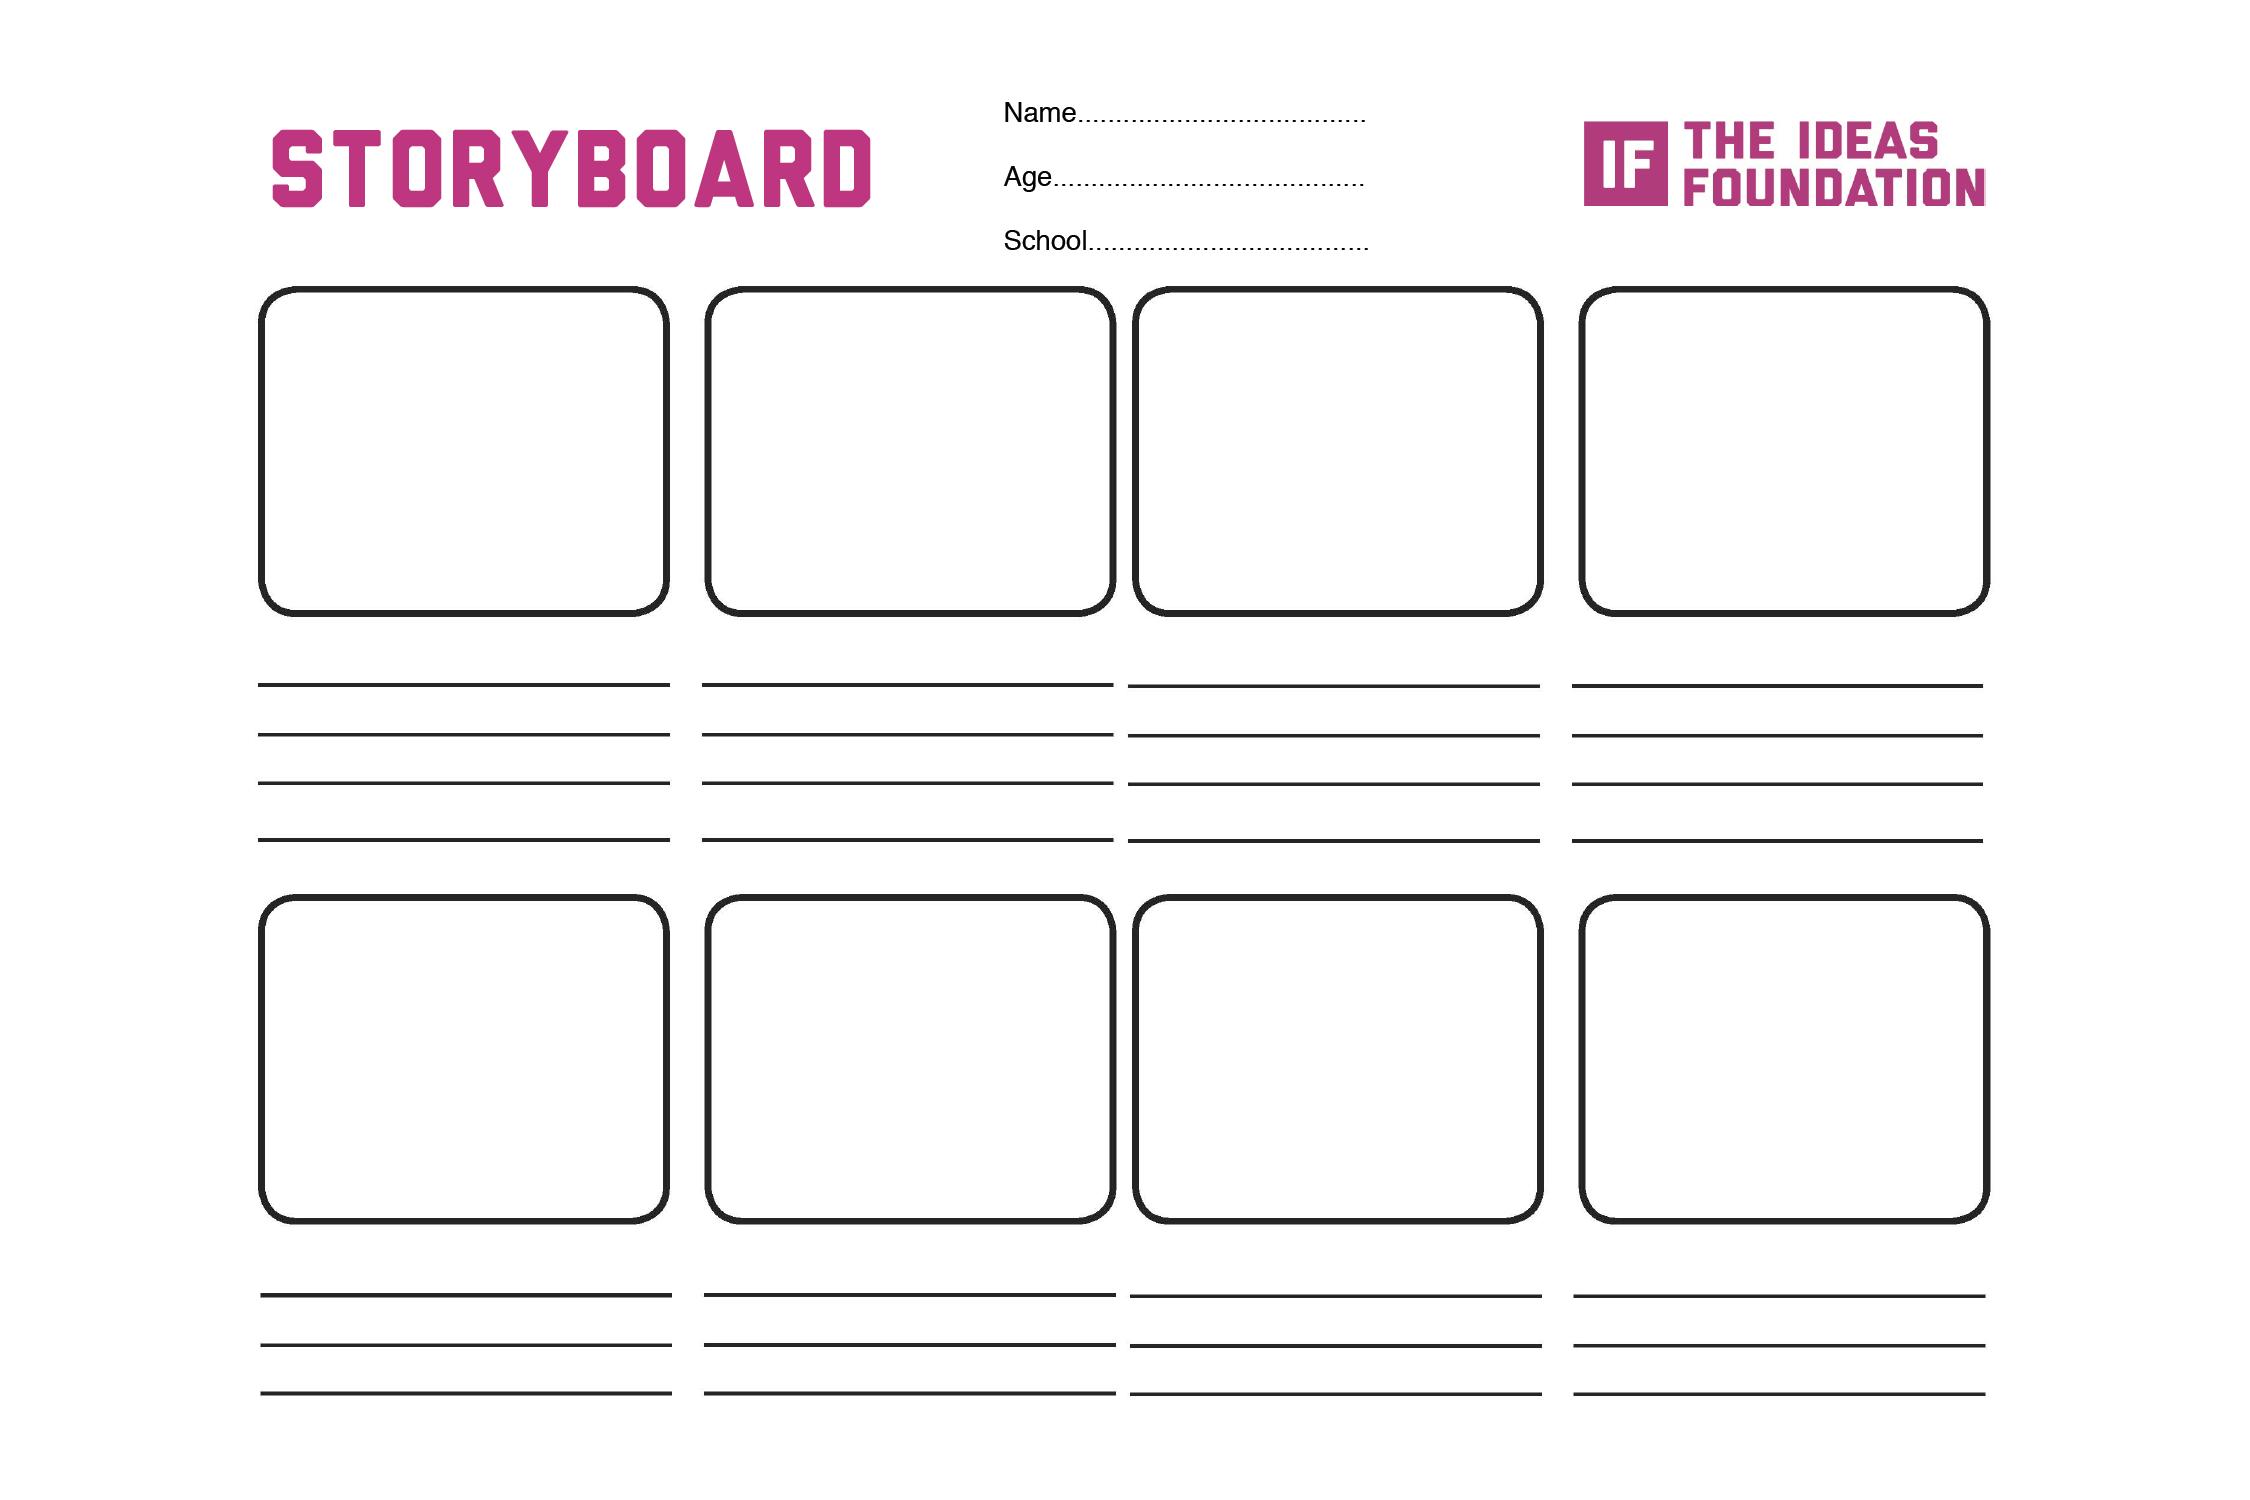 Storyboard (blank)